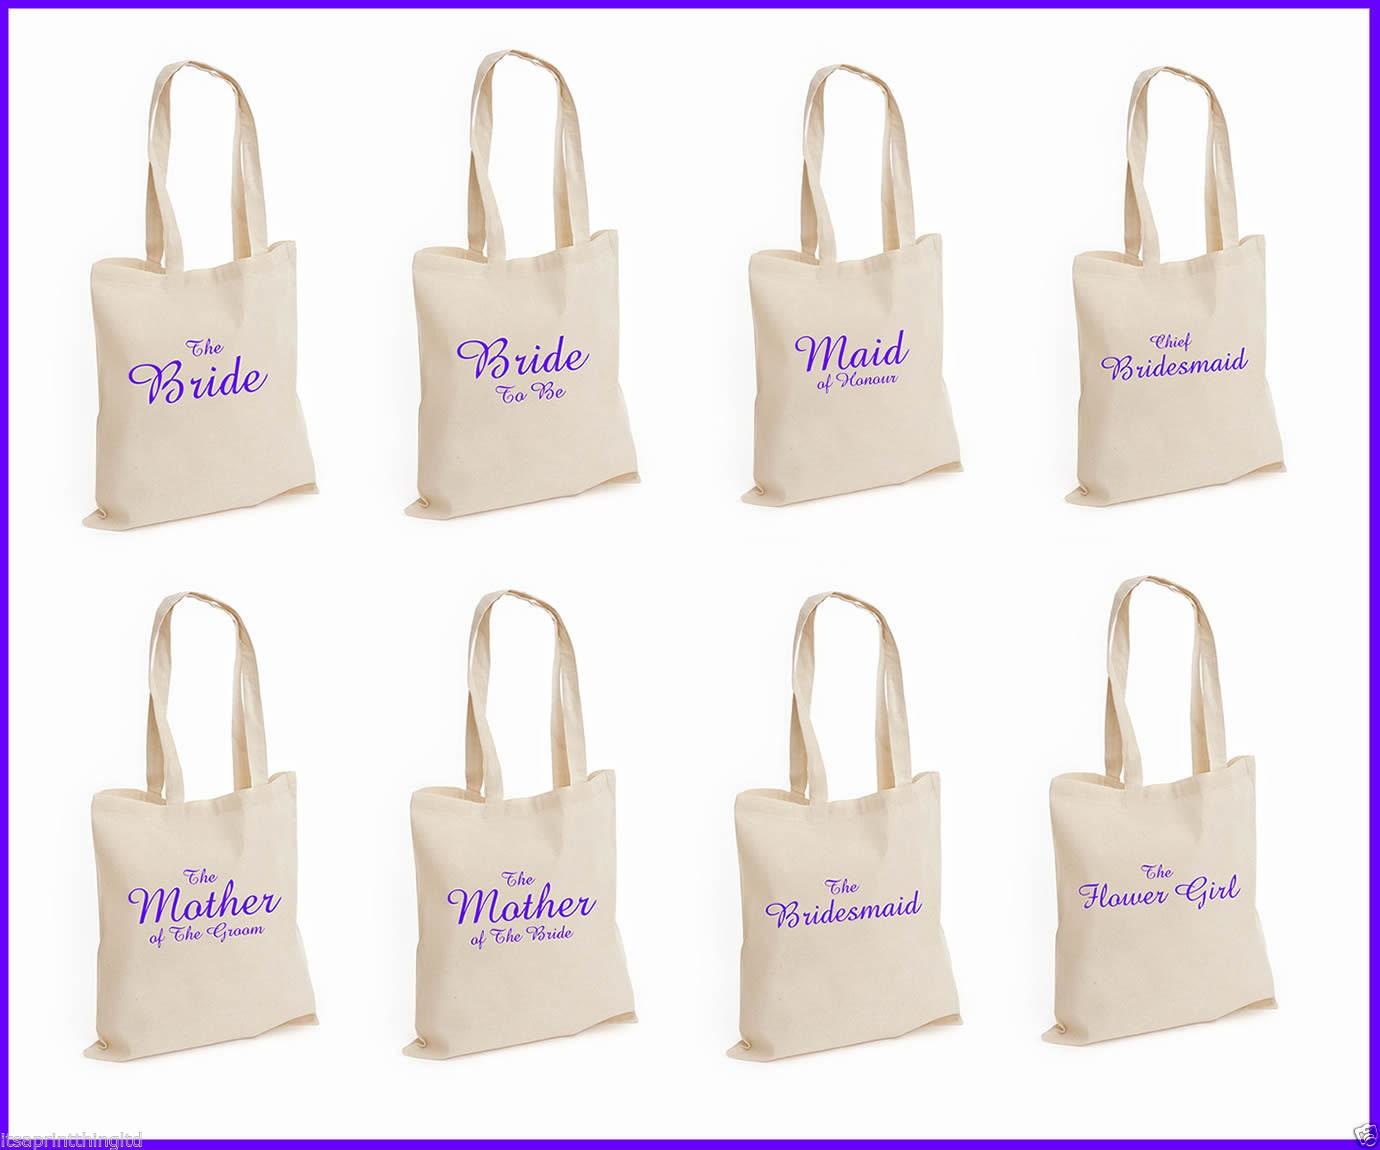 Wedding Party Gifts Uk: Printed Purple Wedding Party Bridal Tote Bags Bridesmaid